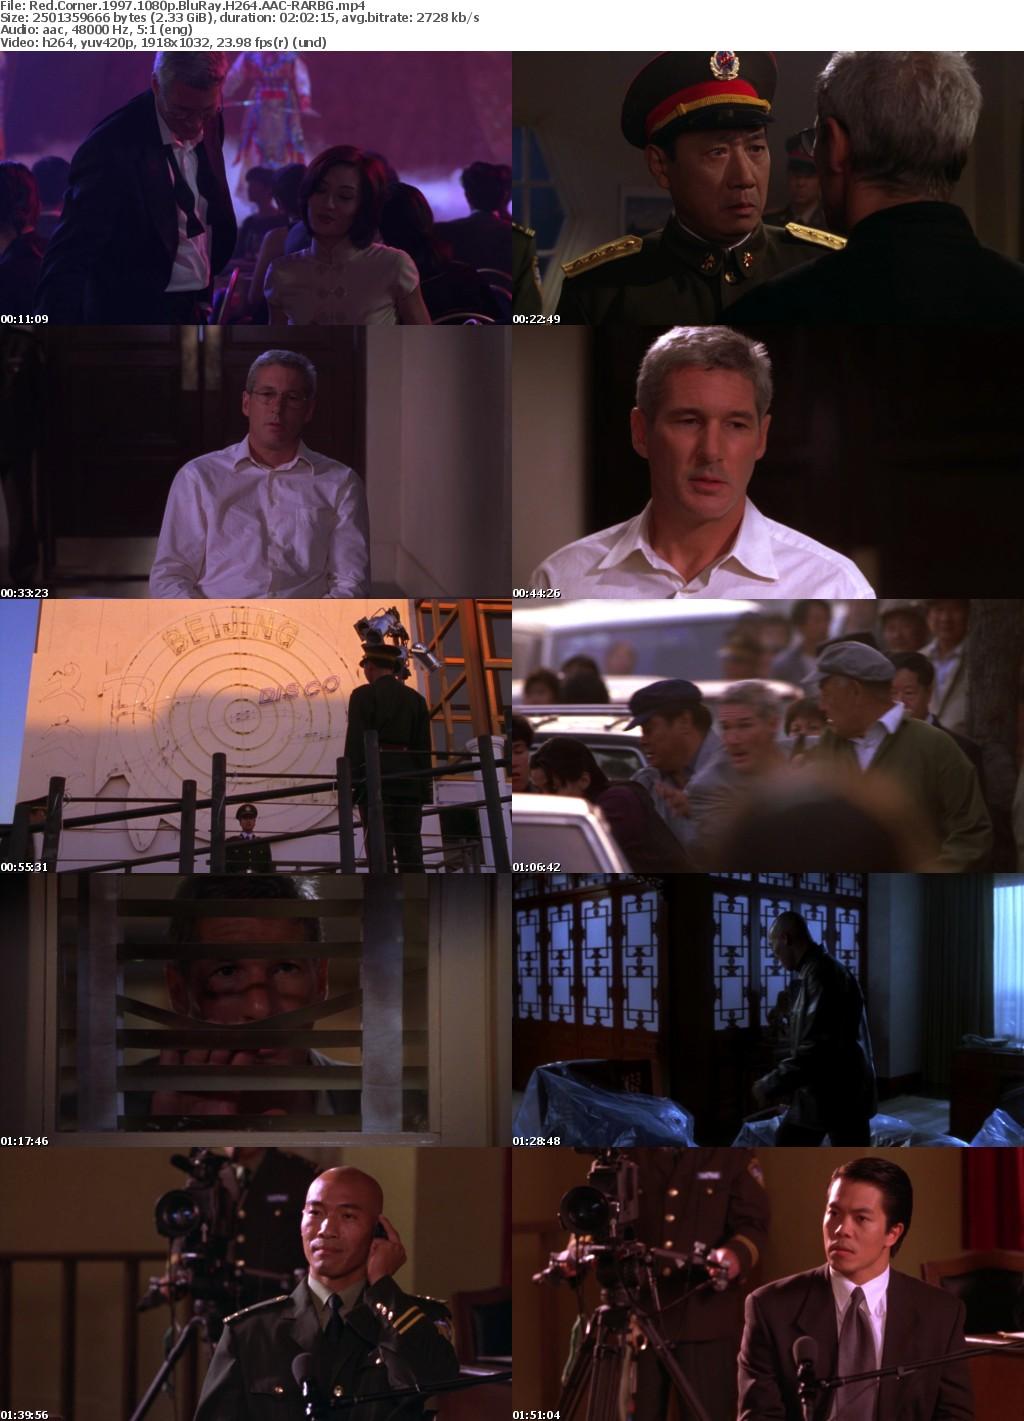 Red Corner (1997) 1080p BluRay H264 AAC-RARBG